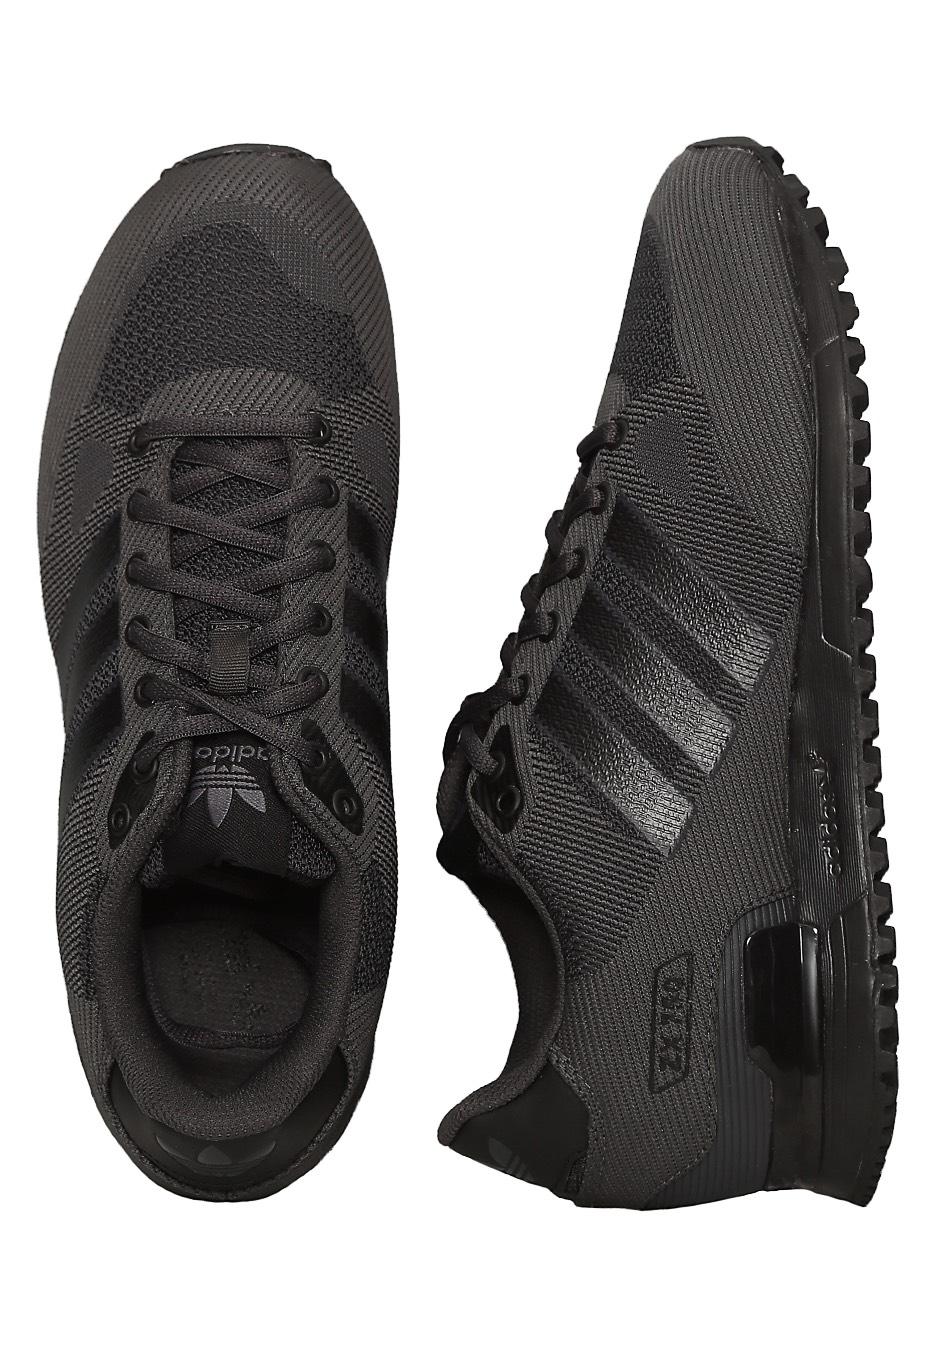 Adidas ZX 750 WV Core BlackCore BlackDark Grey Schuhe